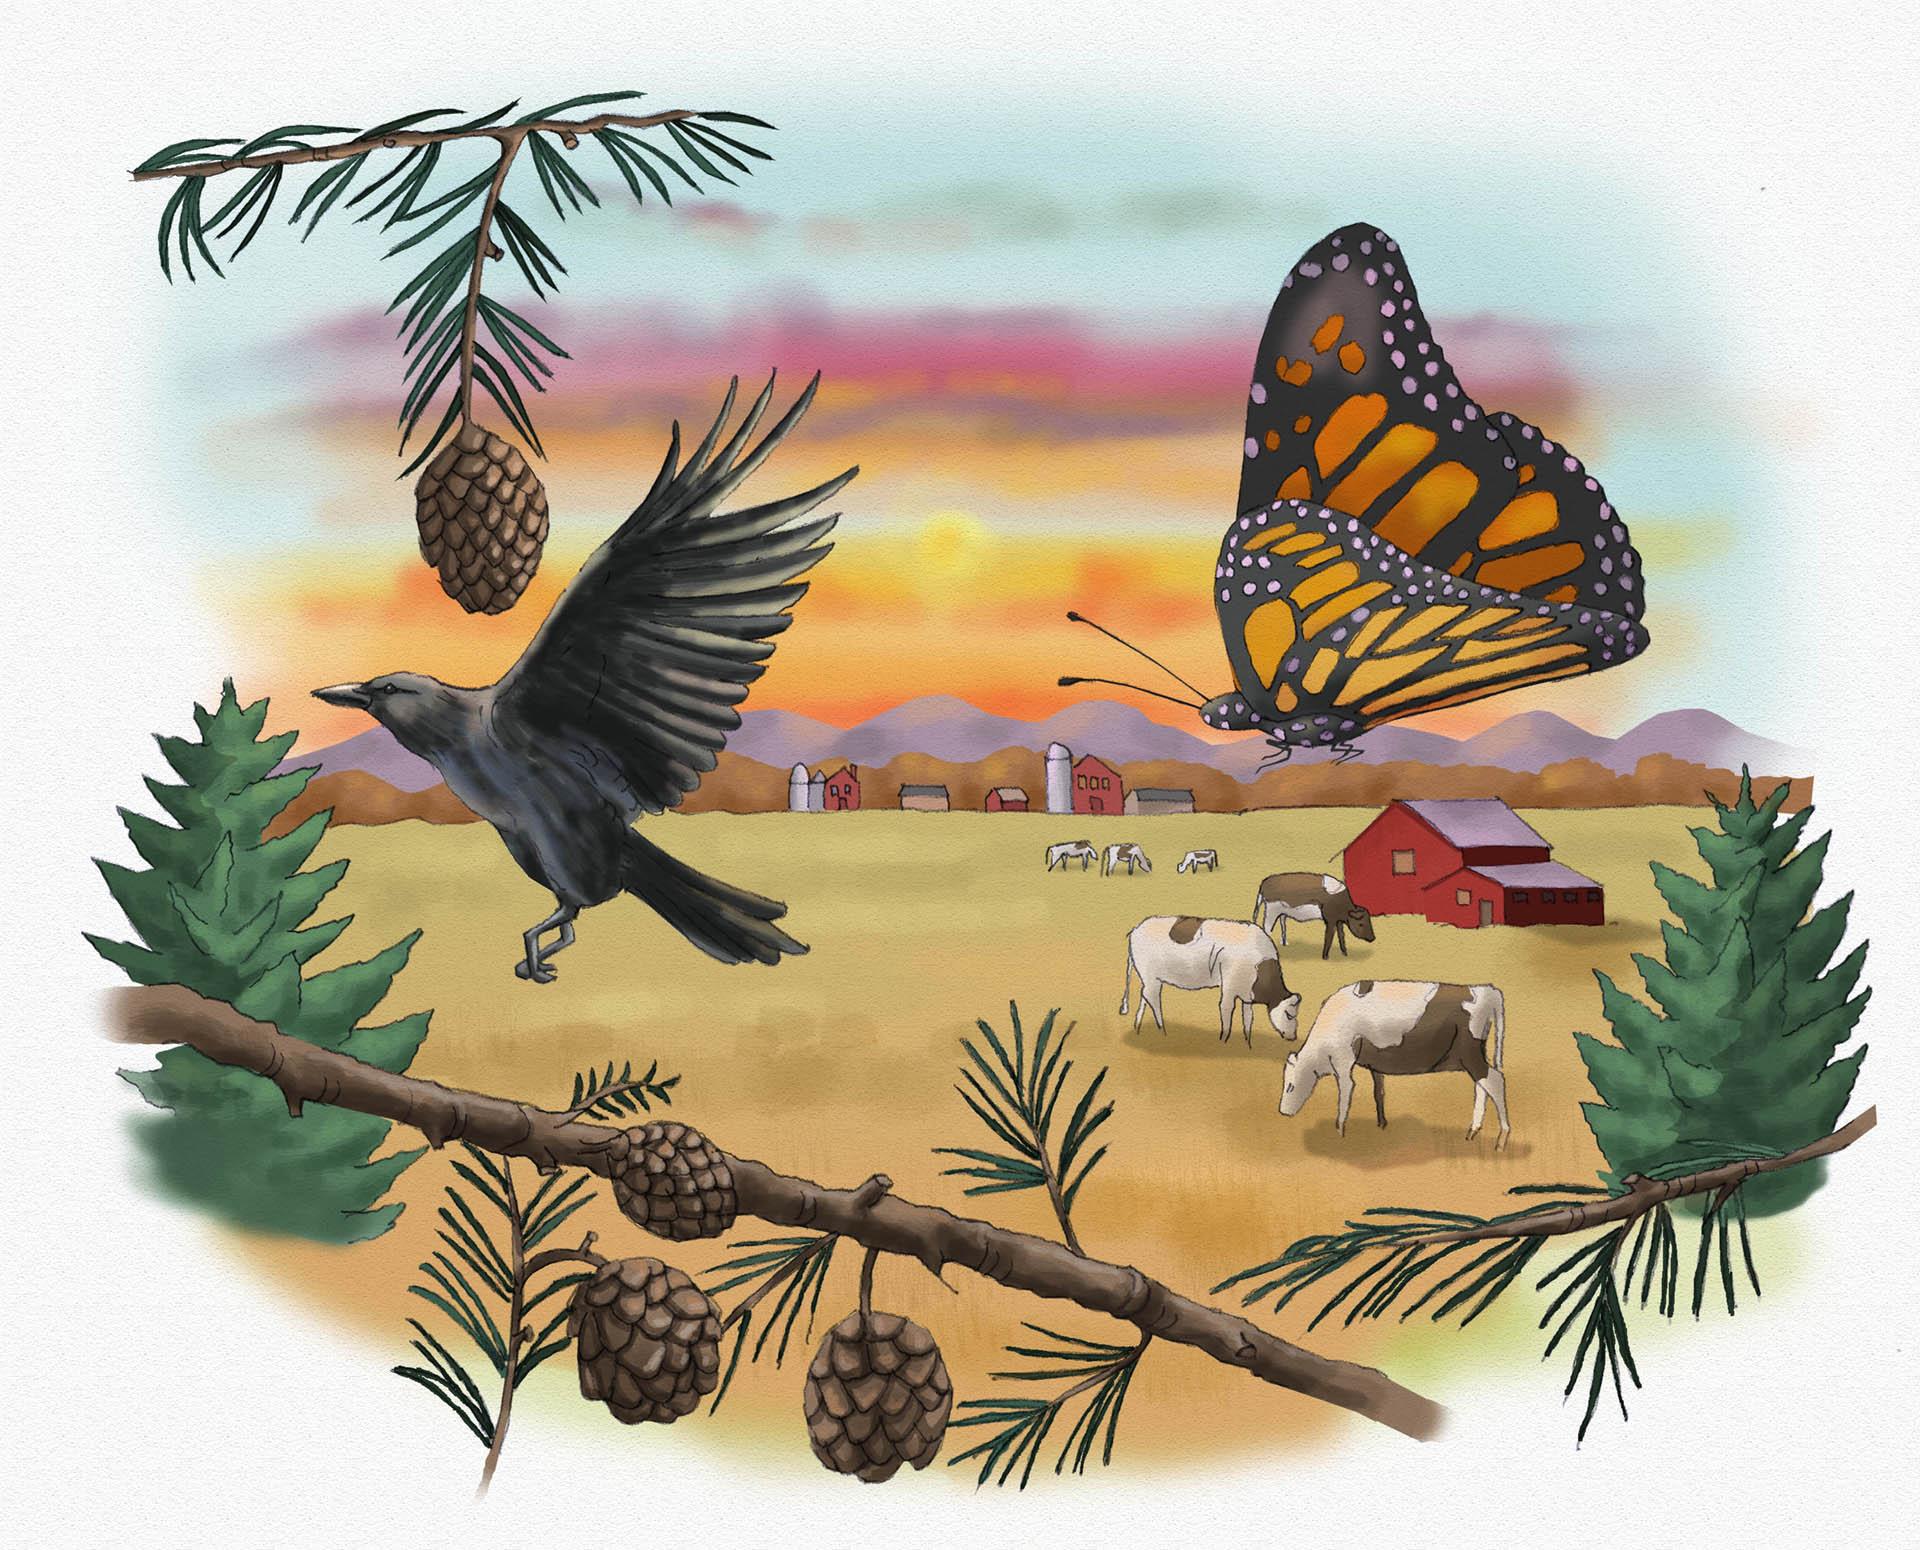 Illustration for Mari's Journey Article • Zootles Magazine